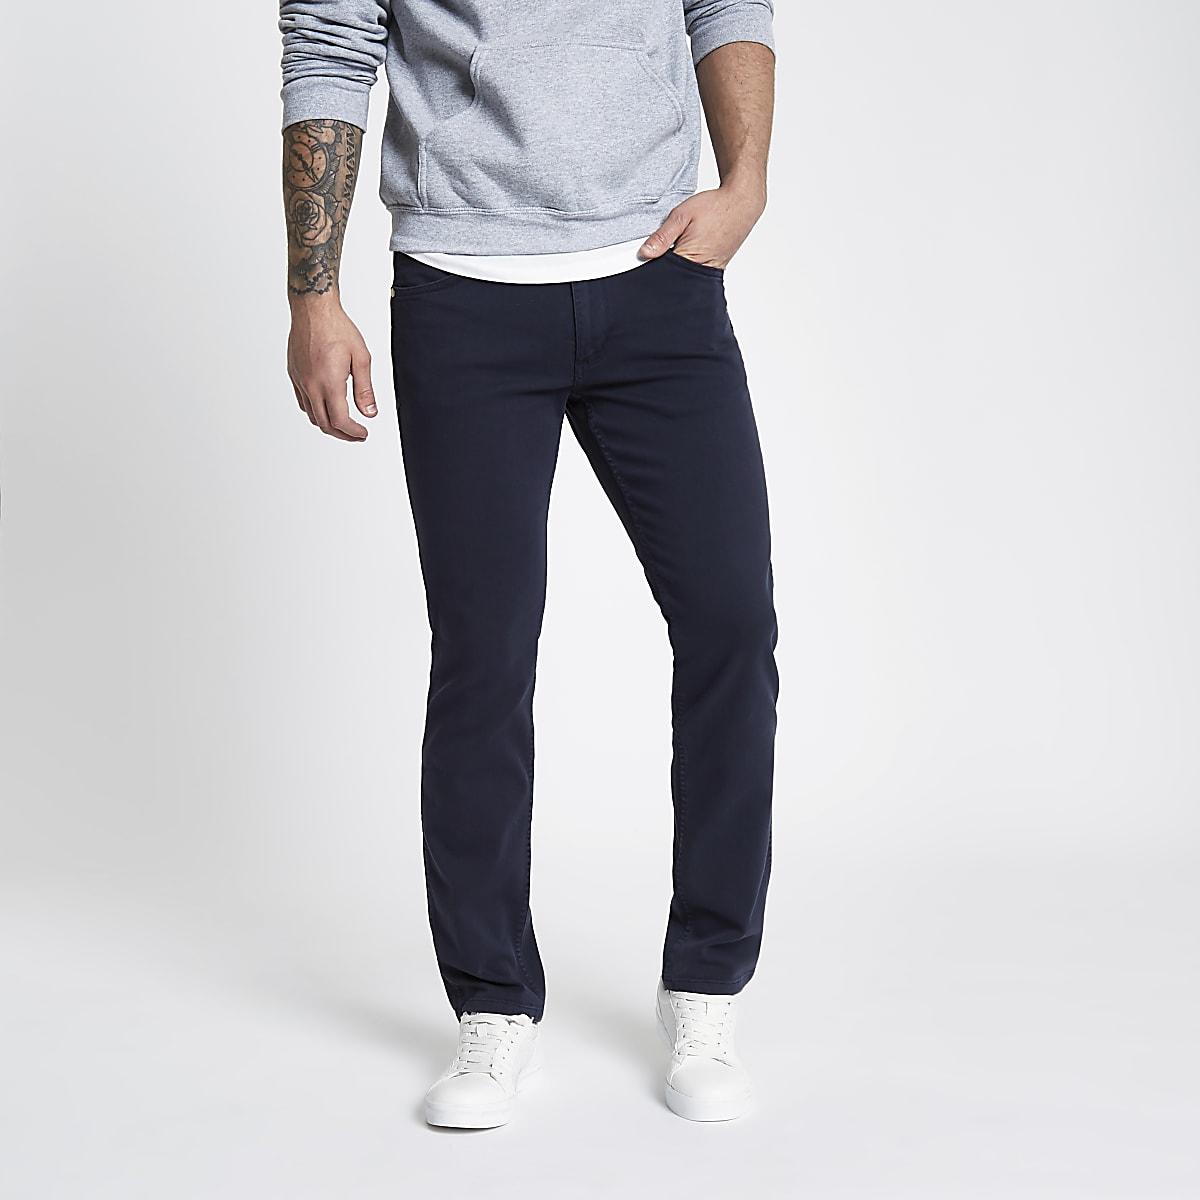 Wrangler dark blue Greensboro jeans